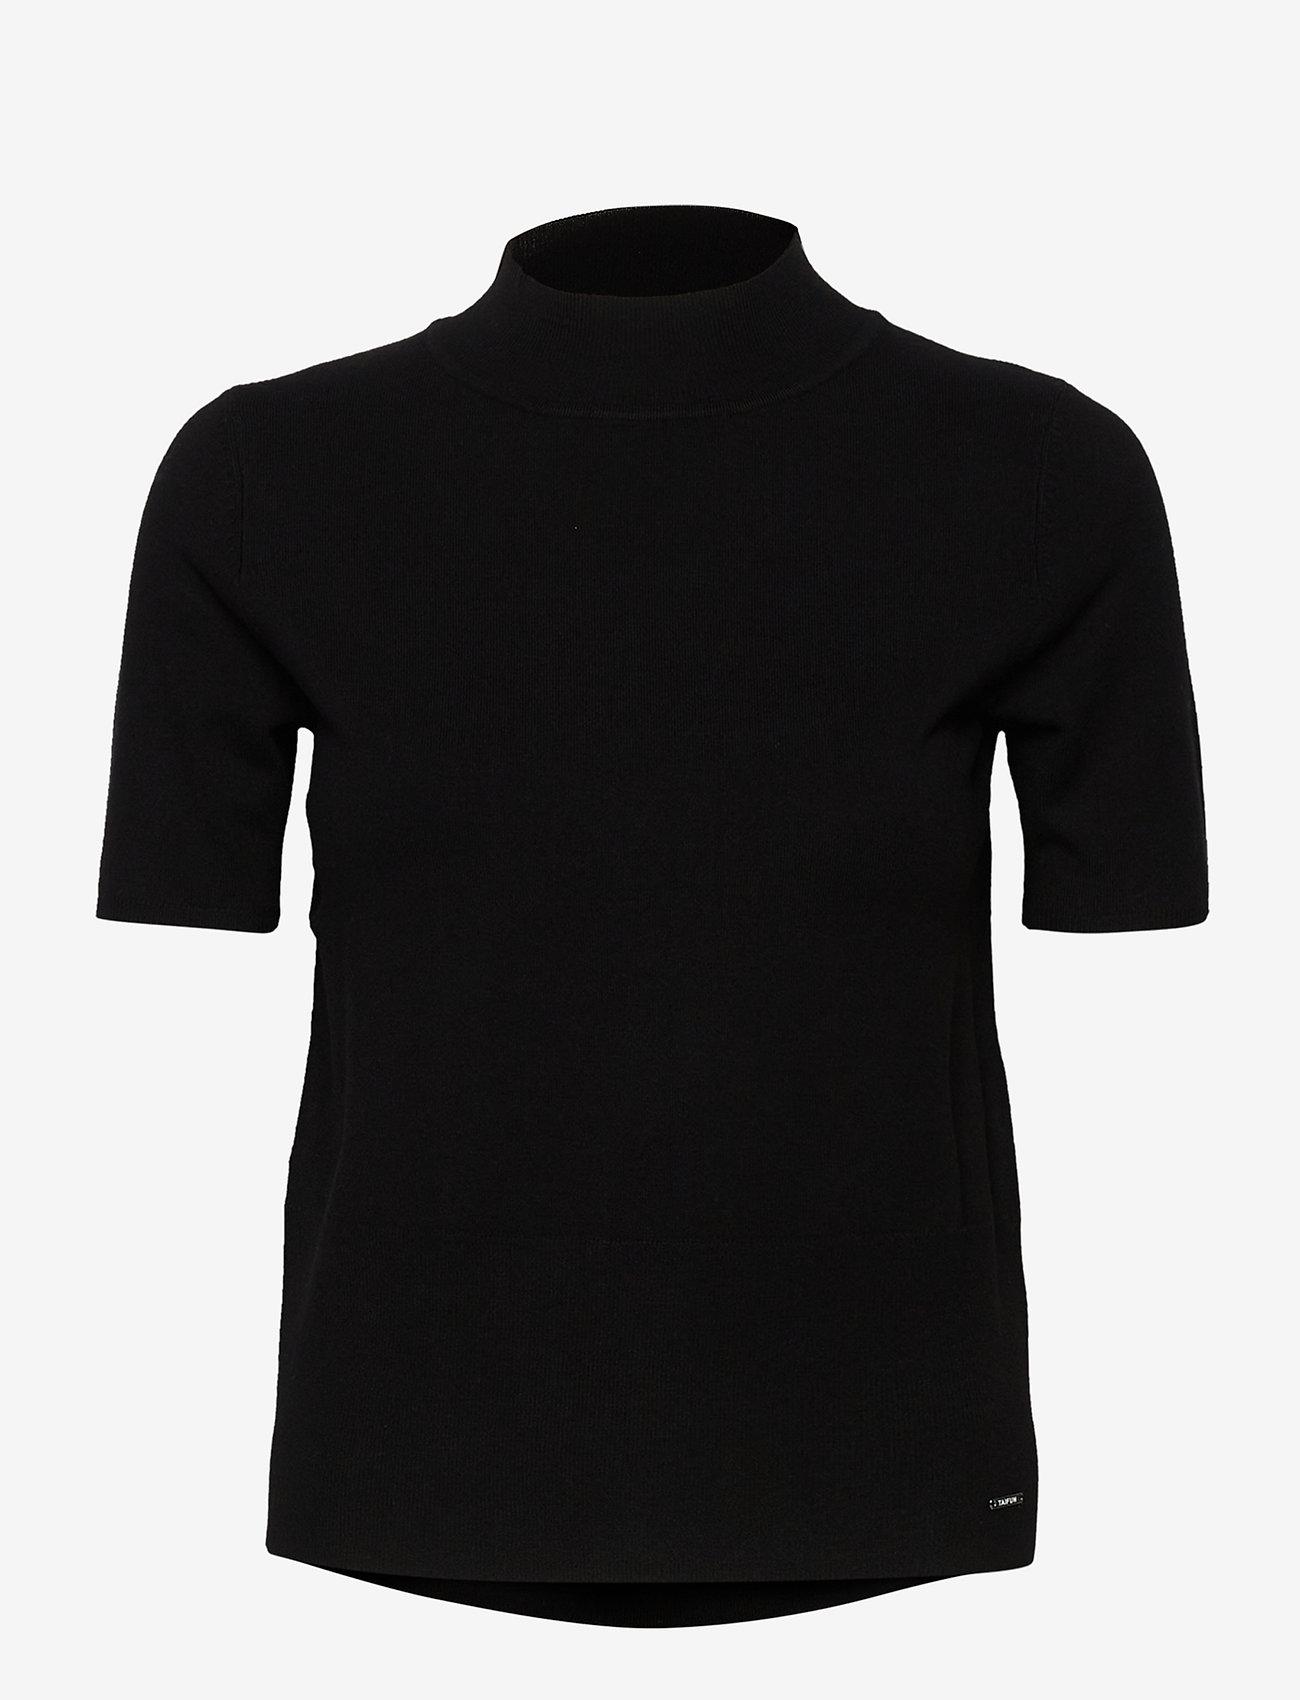 Taifun - PULLOVER 3/4-SLEEVE - stickade toppar & t-shirts - black - 0